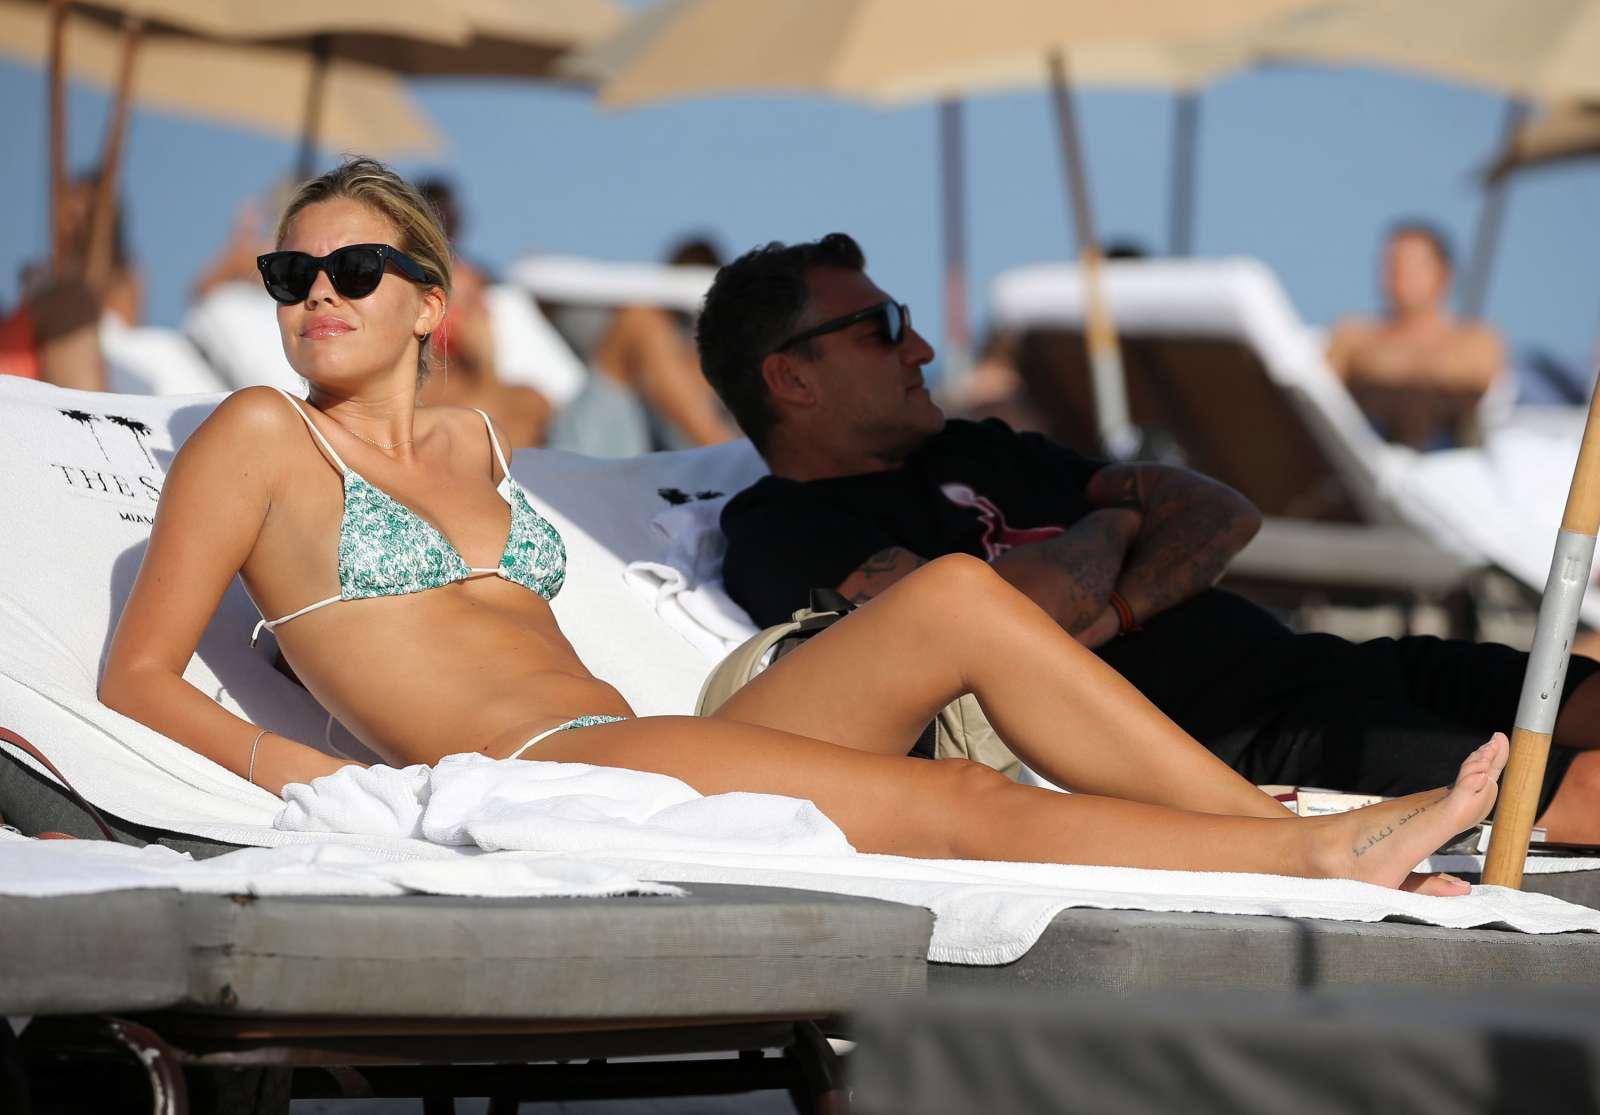 Constance Caracciolo 2017 : Constance Caracciolo in Bikini Sunbathing -10